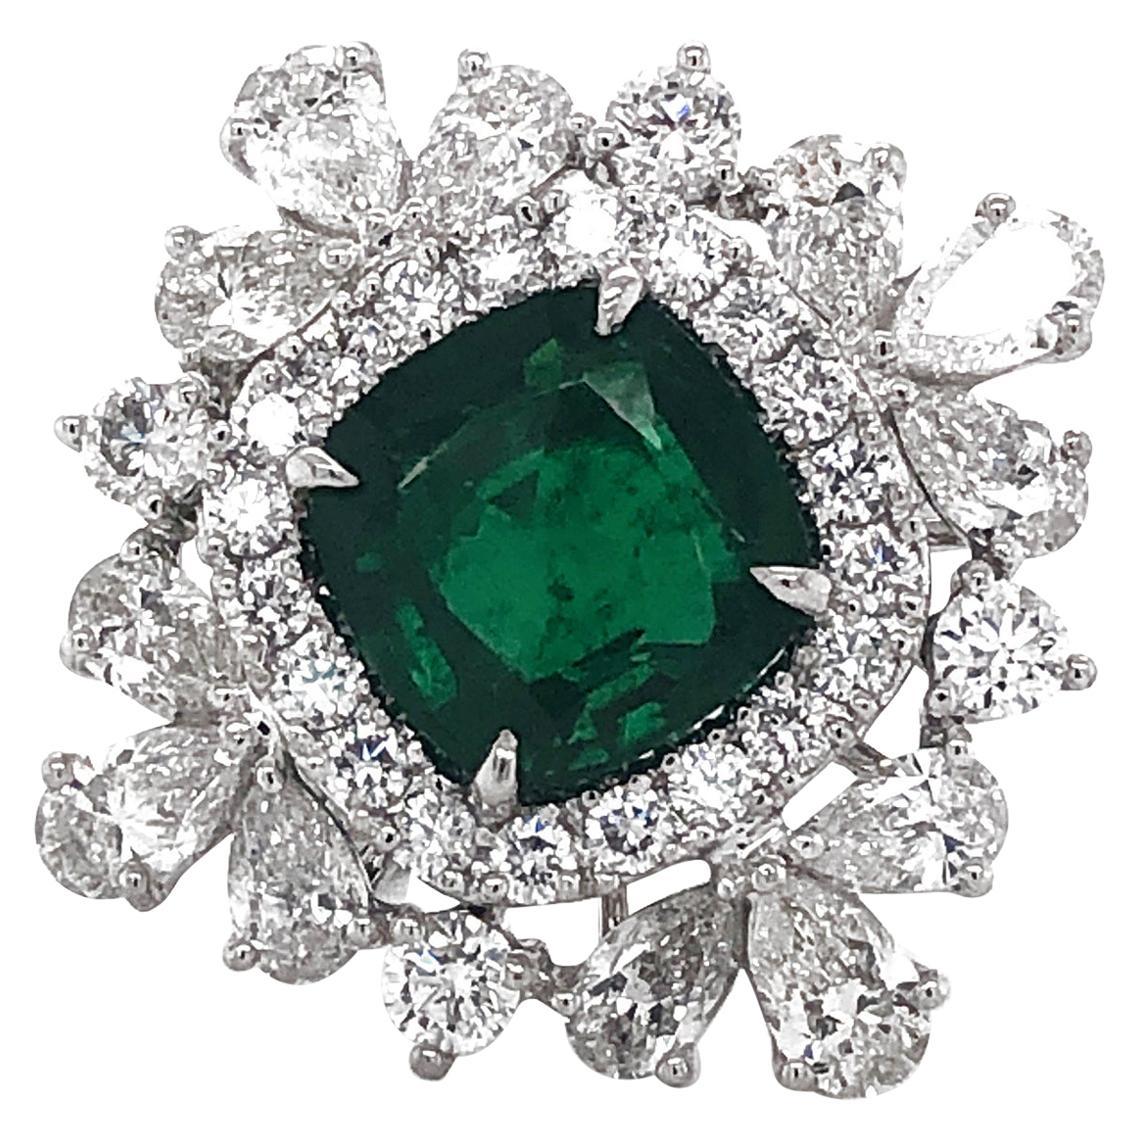 Certified Zambian Cushion Cut Emerald 4.65 Carat Diamond Platinum Cocktail Ring